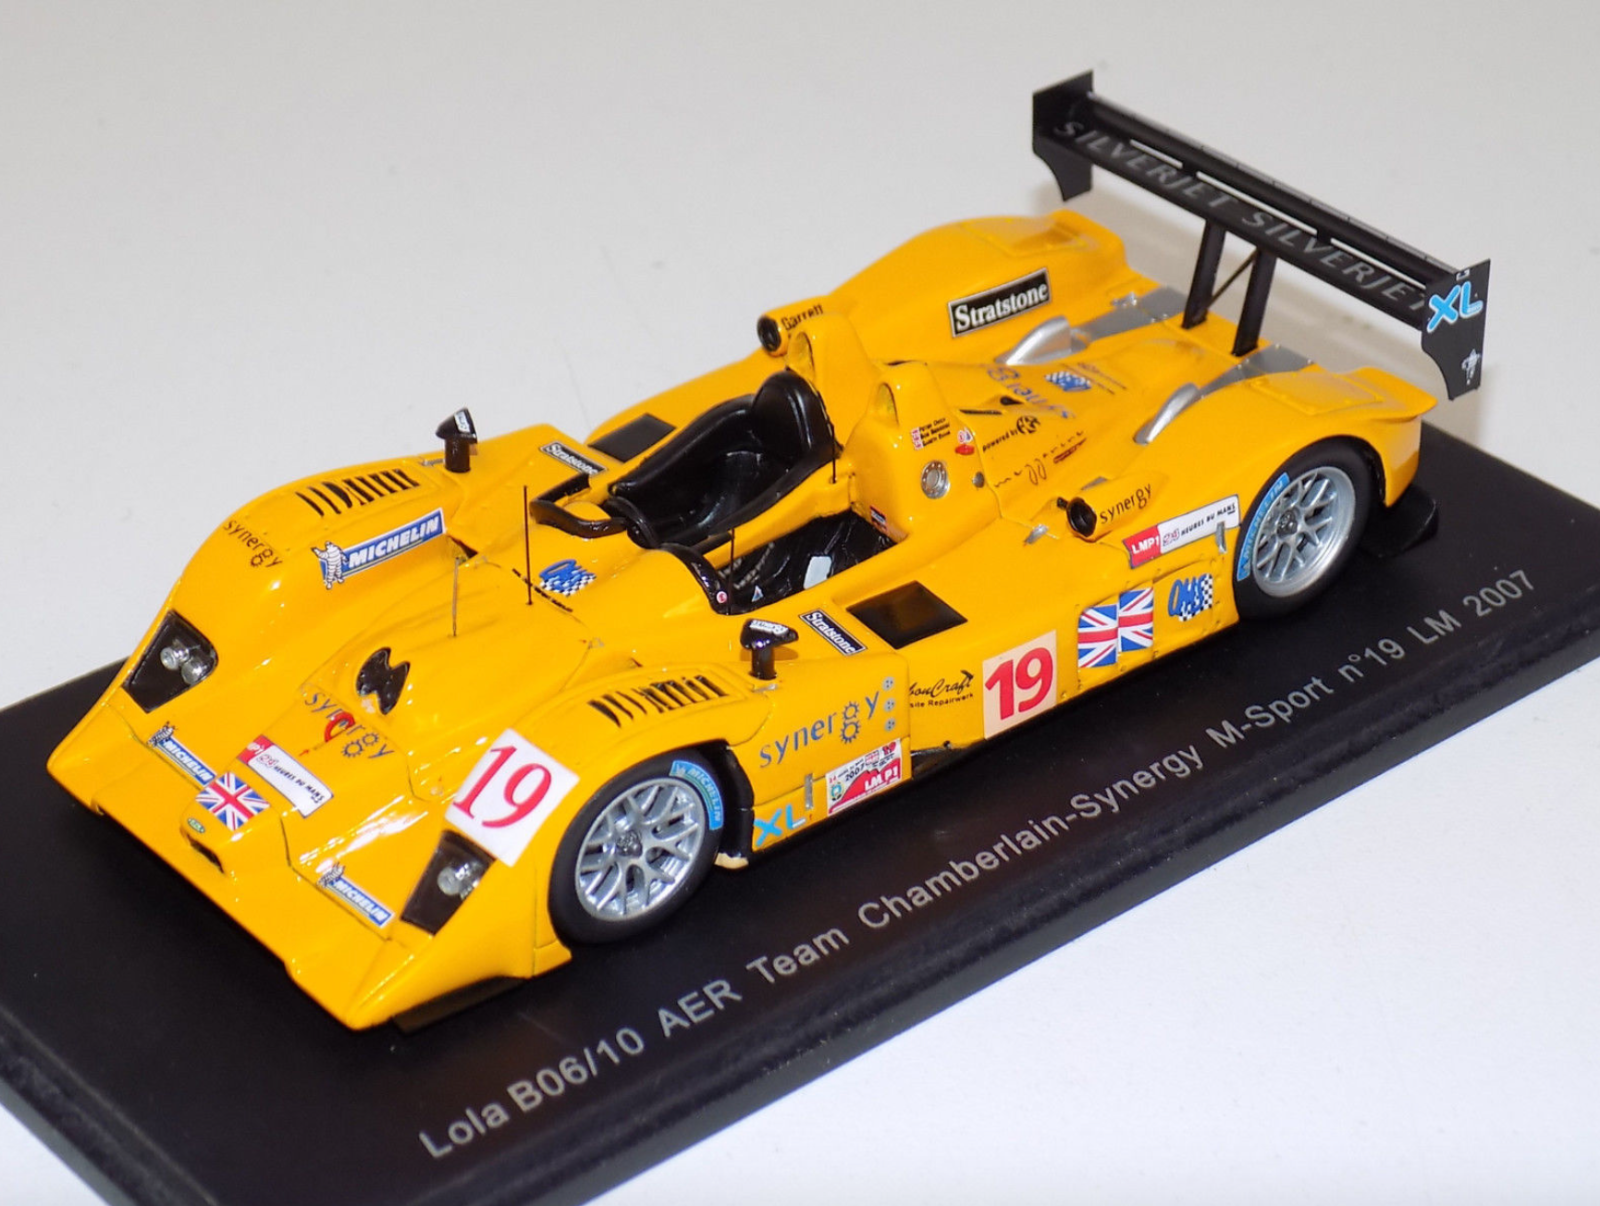 1/43 Spark Lola B06/10 AER equipo Chamberlain sinergia 19 24 horas lemans S0240